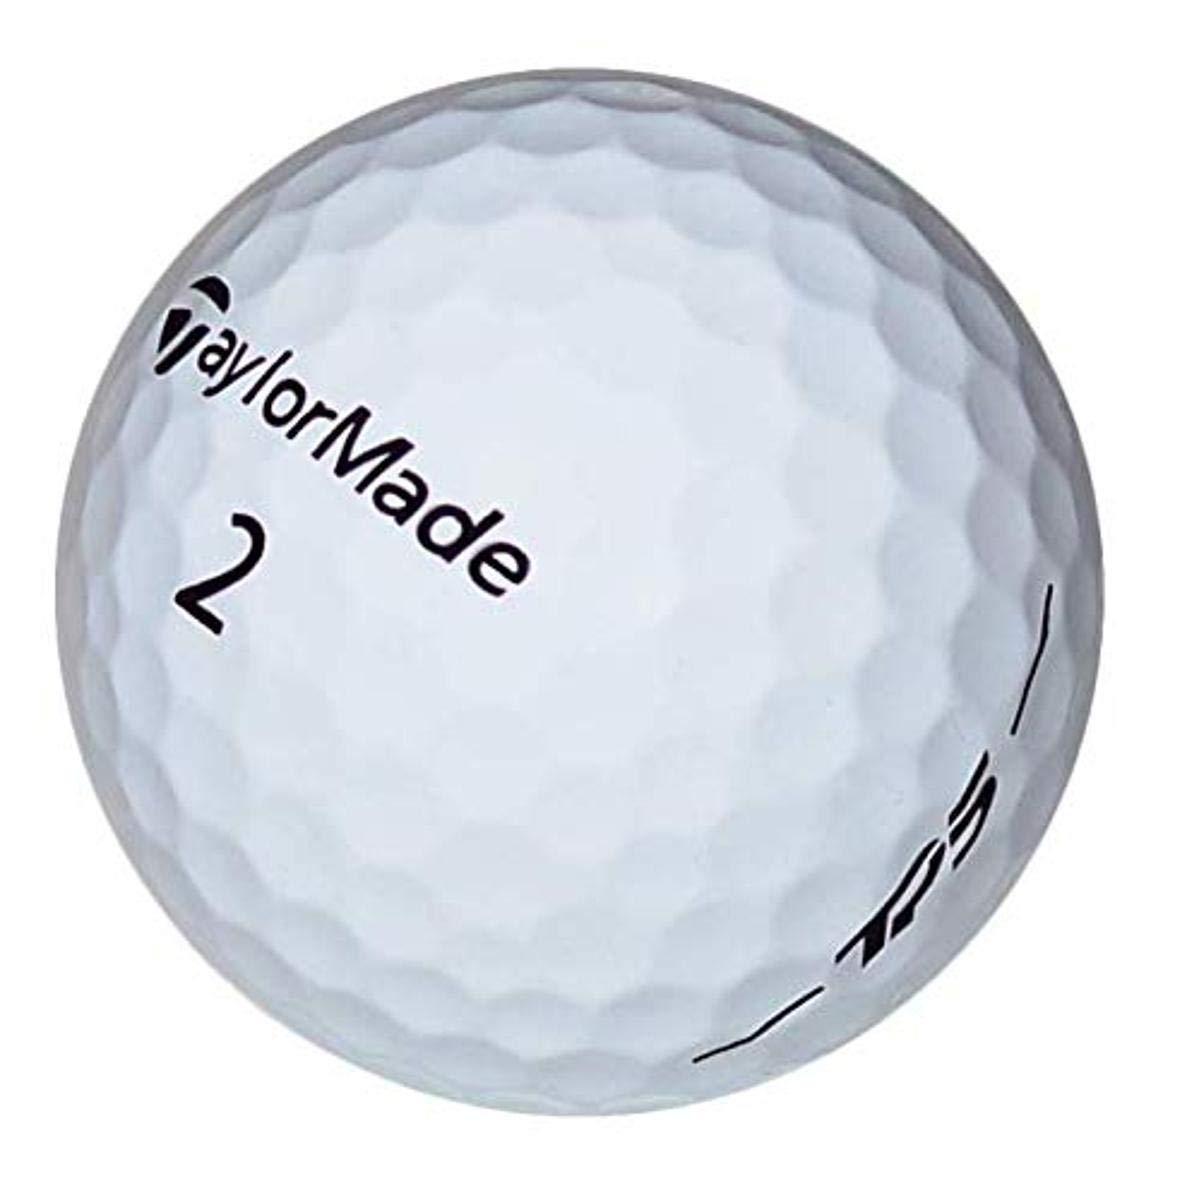 GolfBallHero Taylormade TP5 Refurbished Golf Balls (36 Pack)